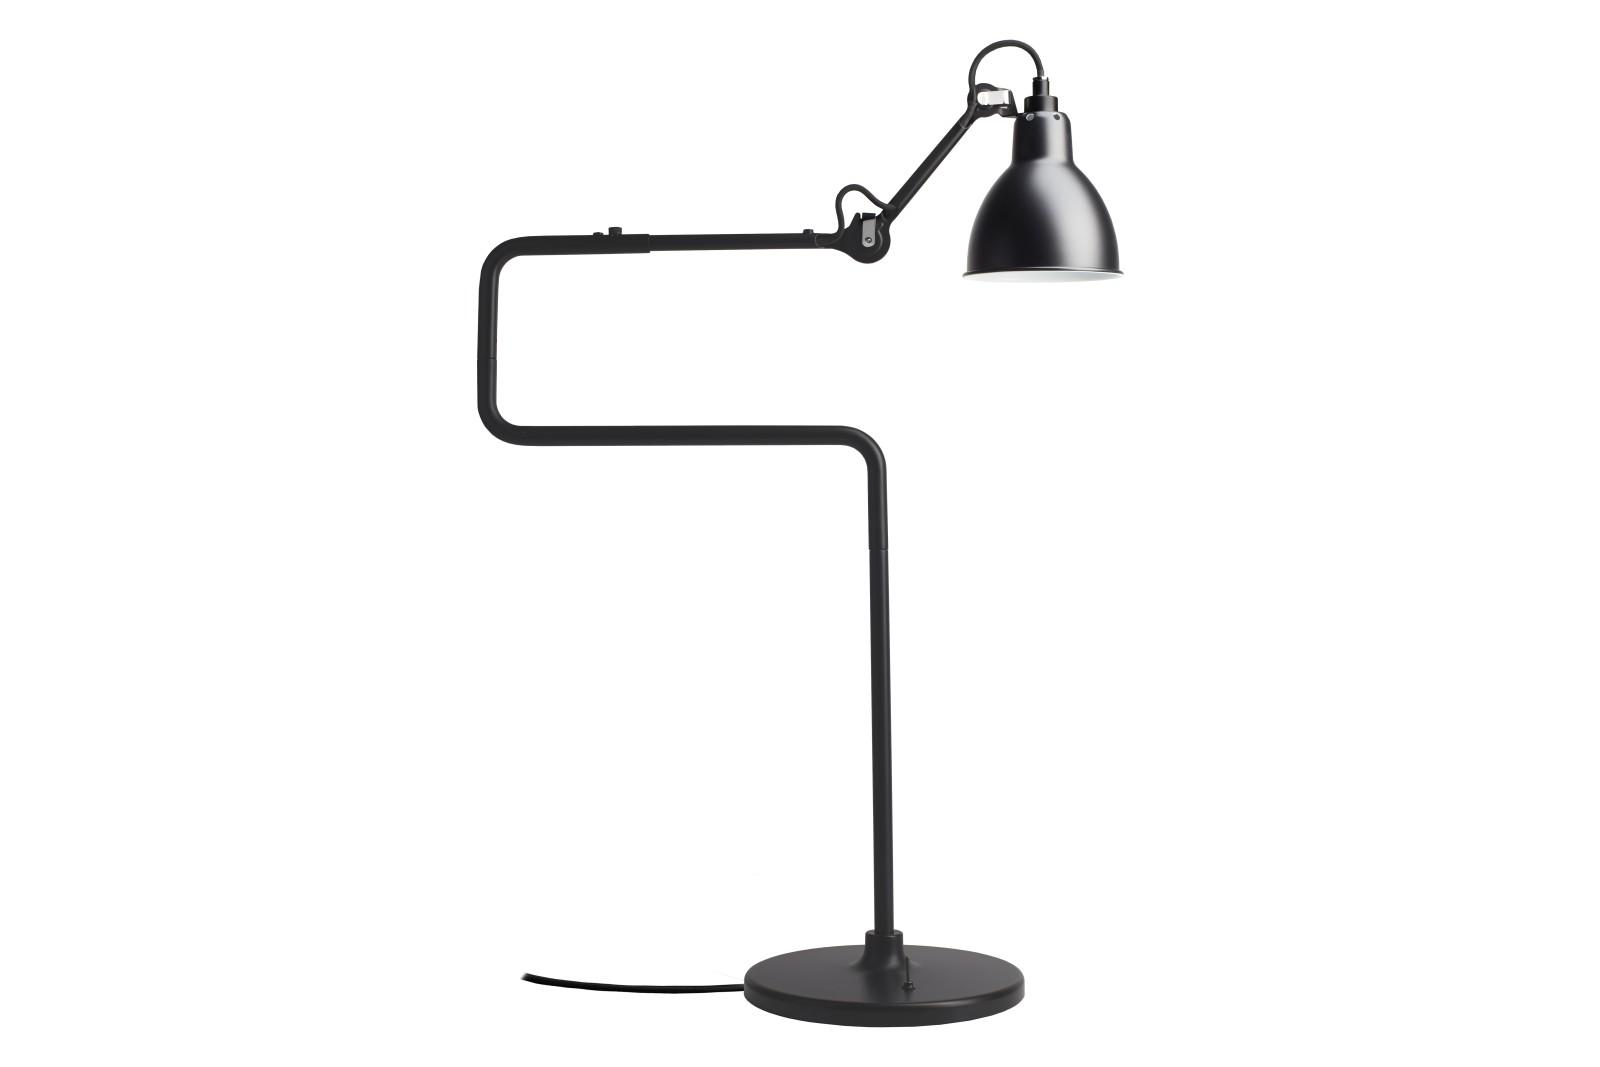 Lampe Gras N 317 Round Shade Table Lamp Black Shade